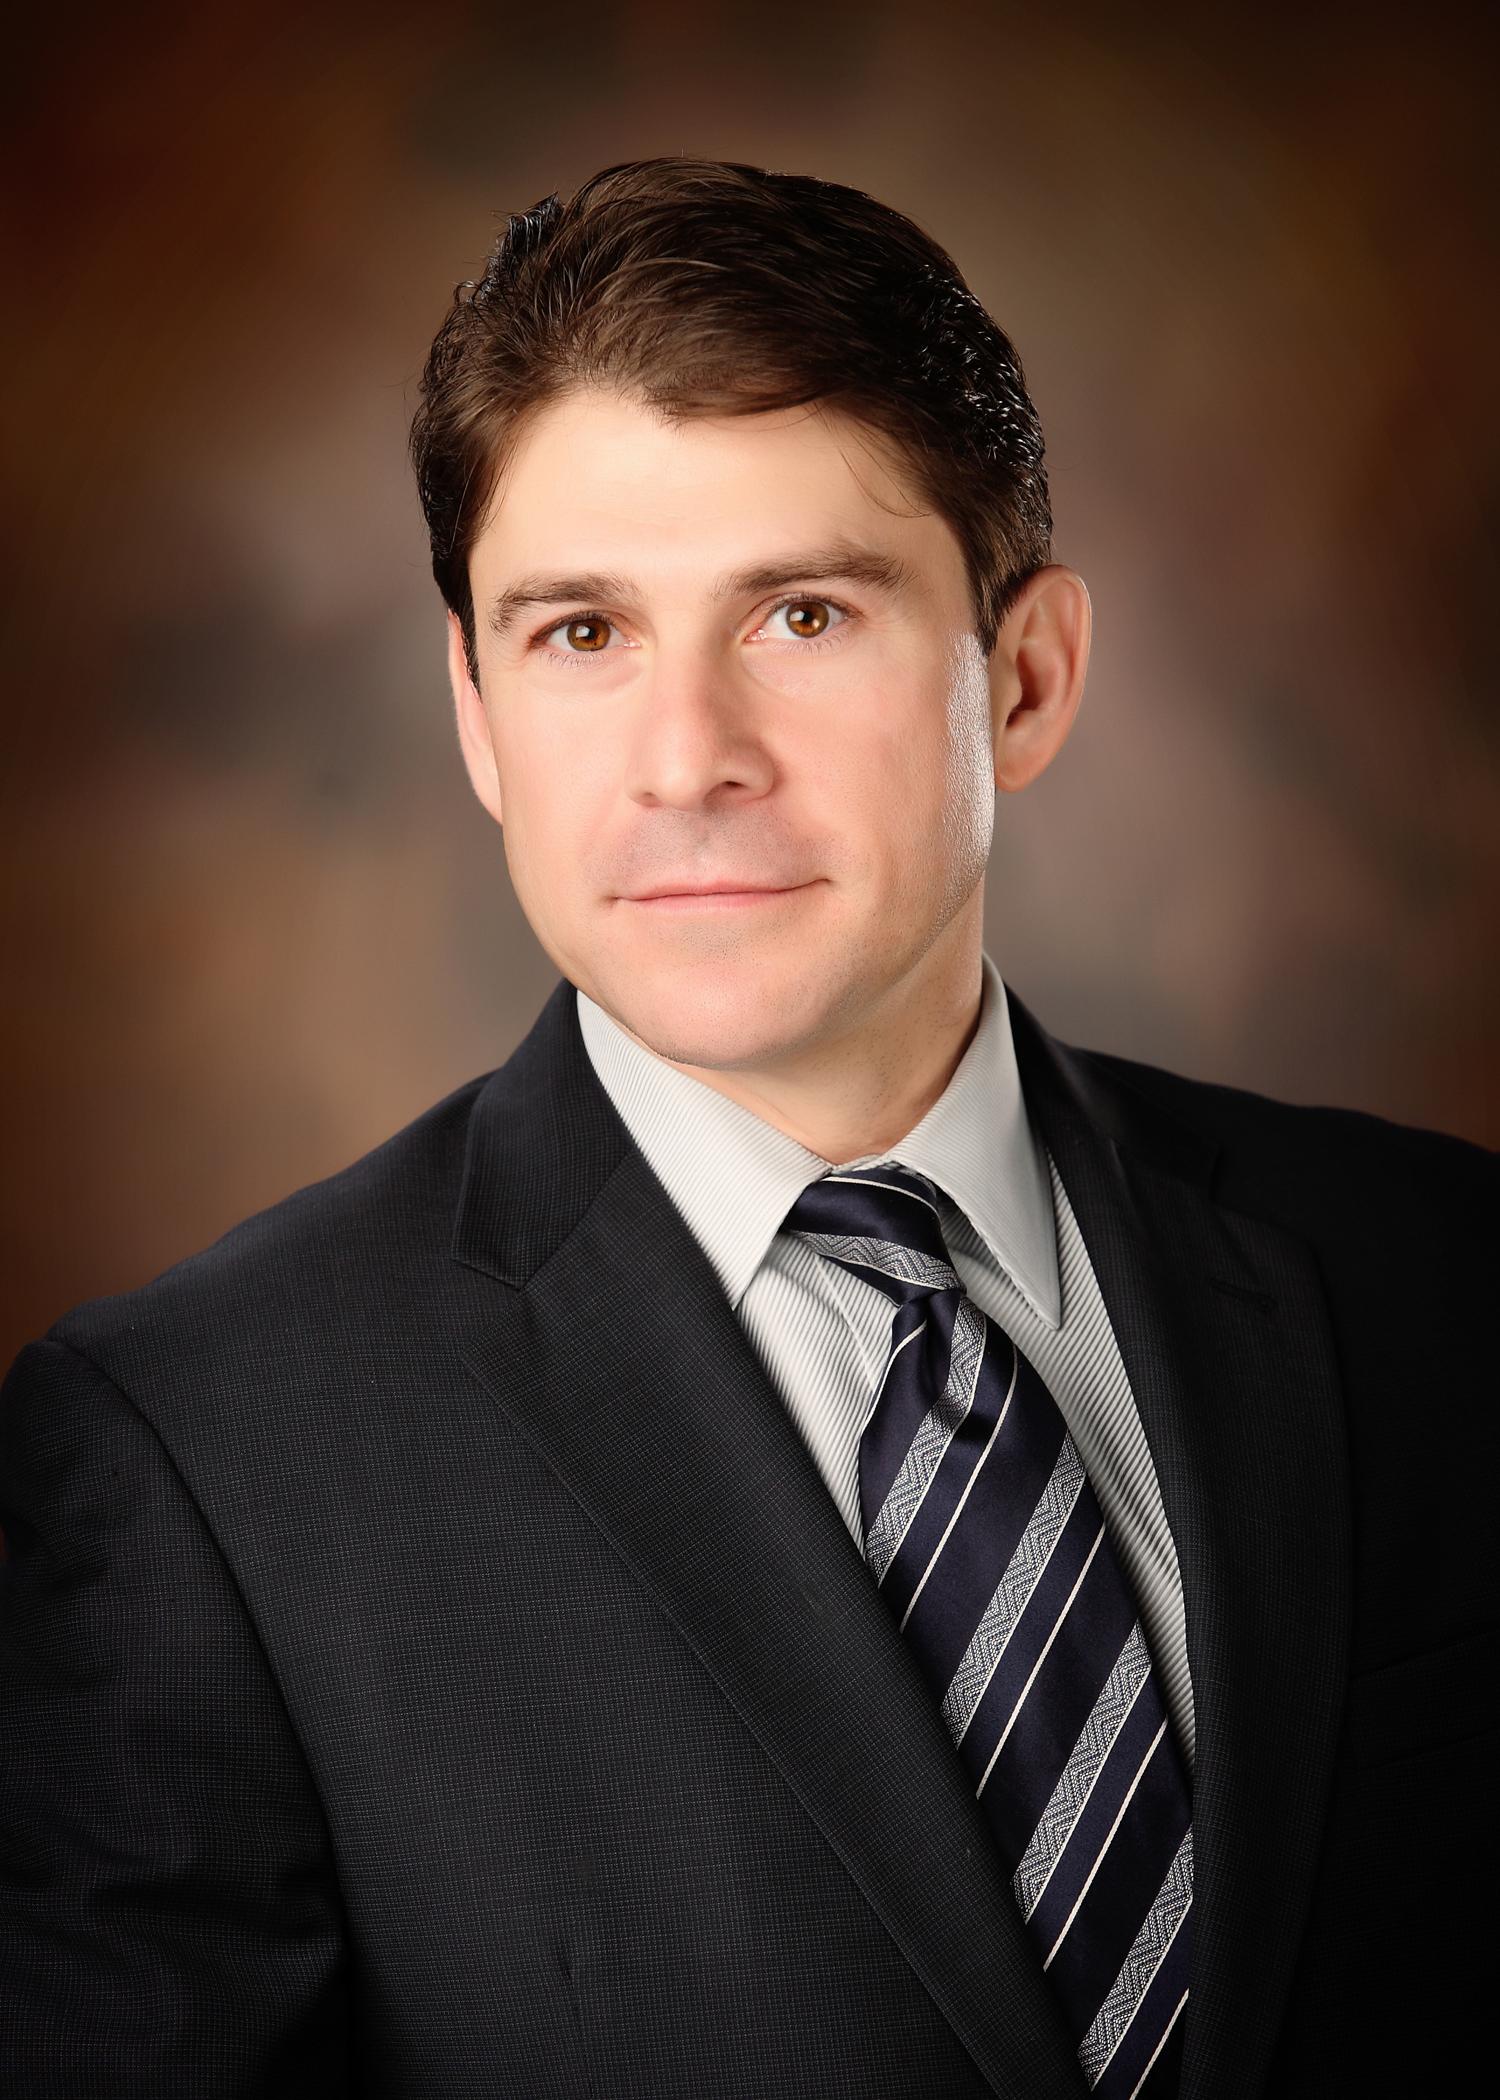 Dr. Richard S. Bartholomew Orthopedic Surgeon: Knee and Shoulder Surgeon Specialist